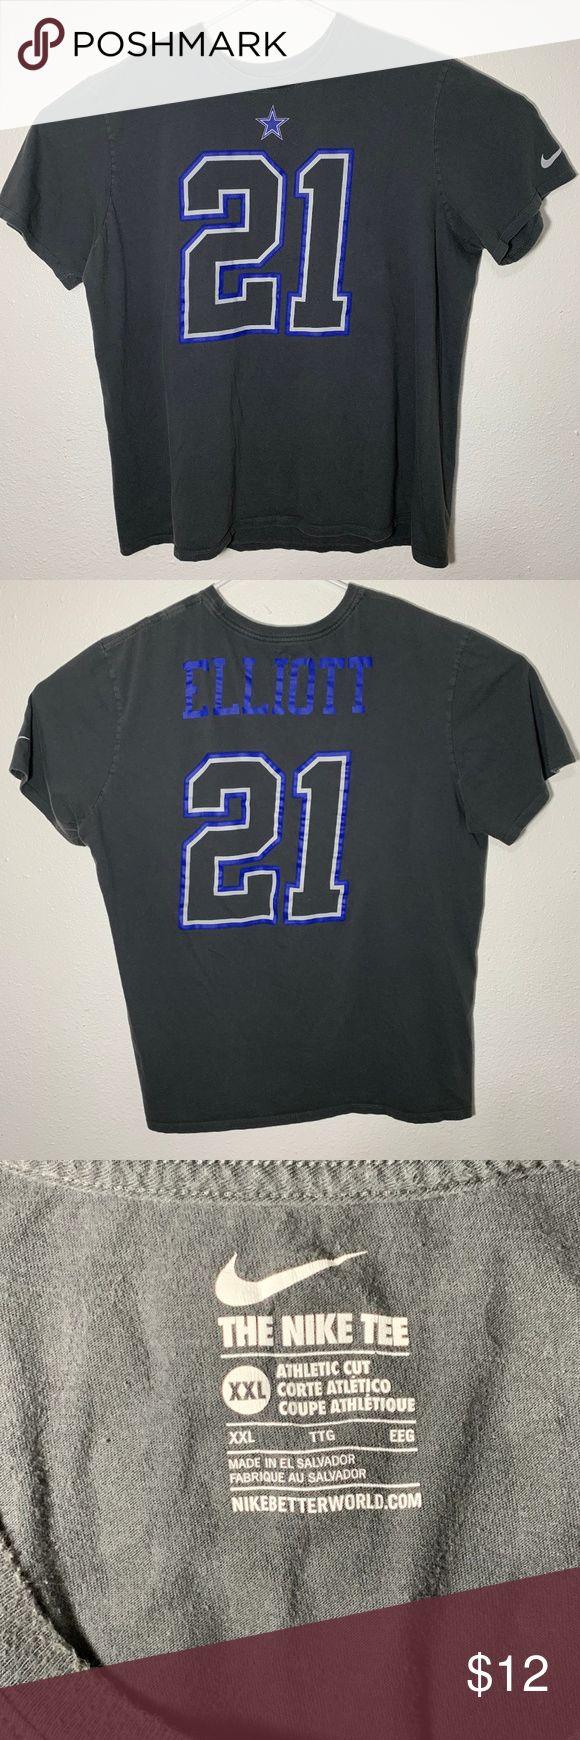 Dallas Cowboys Ezekiel Elliot Nike XXL Shirt Dallas